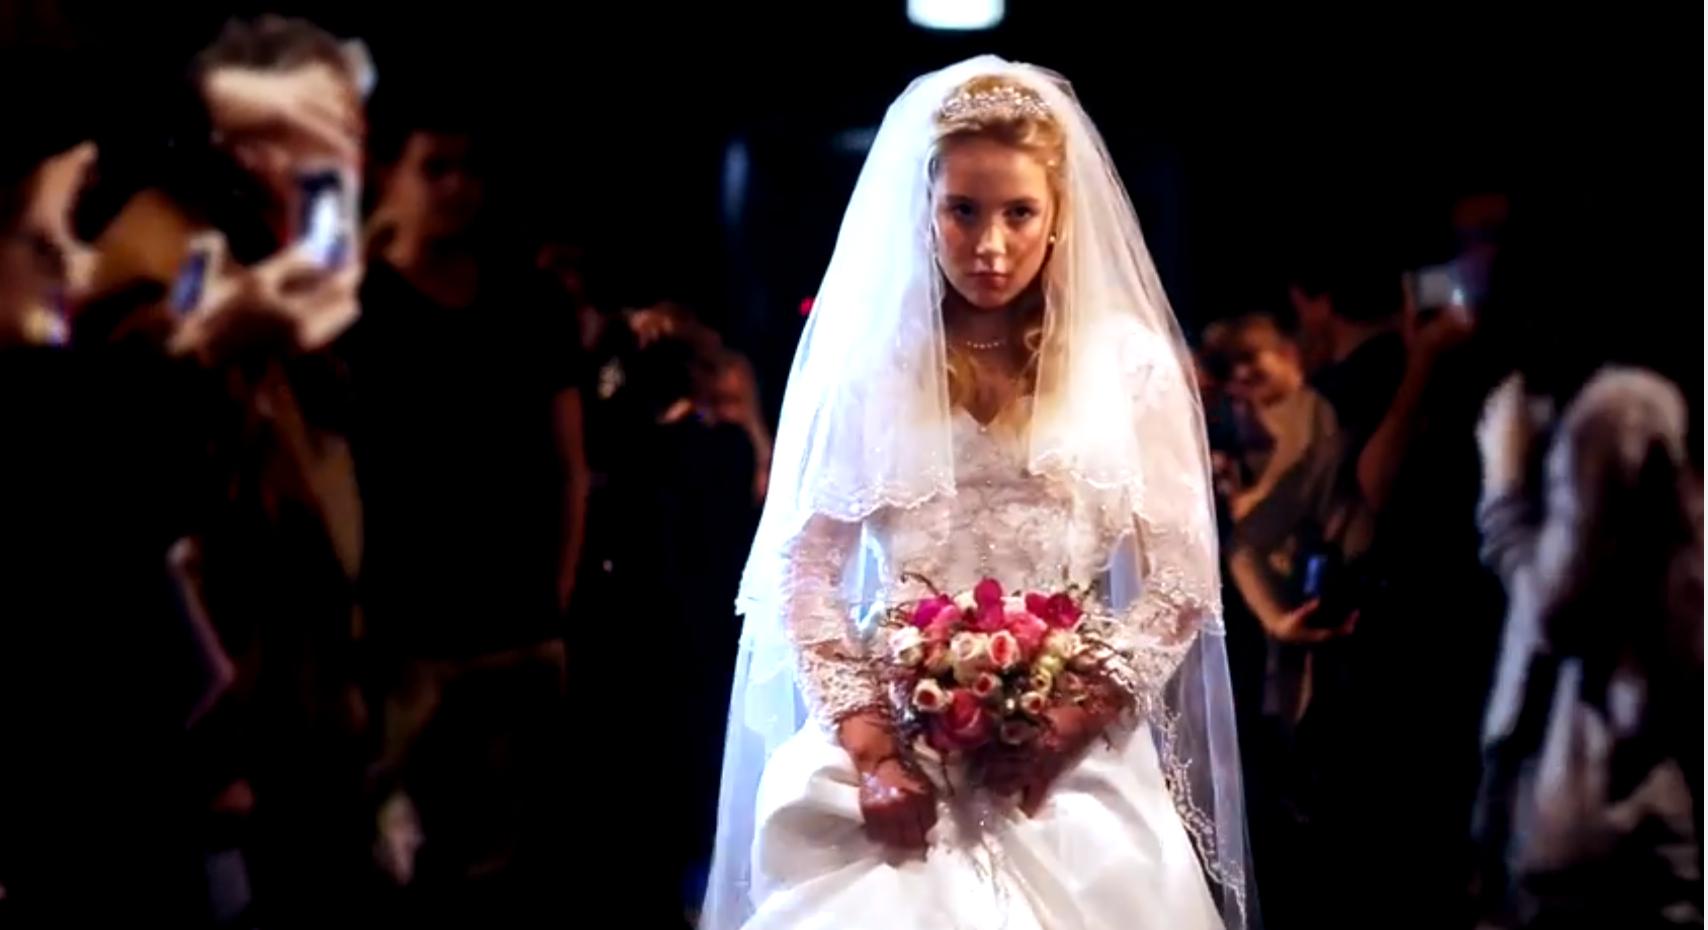 Matrimonio In Egitto : Egitto matrimonio tra cugini di e anni famiglie